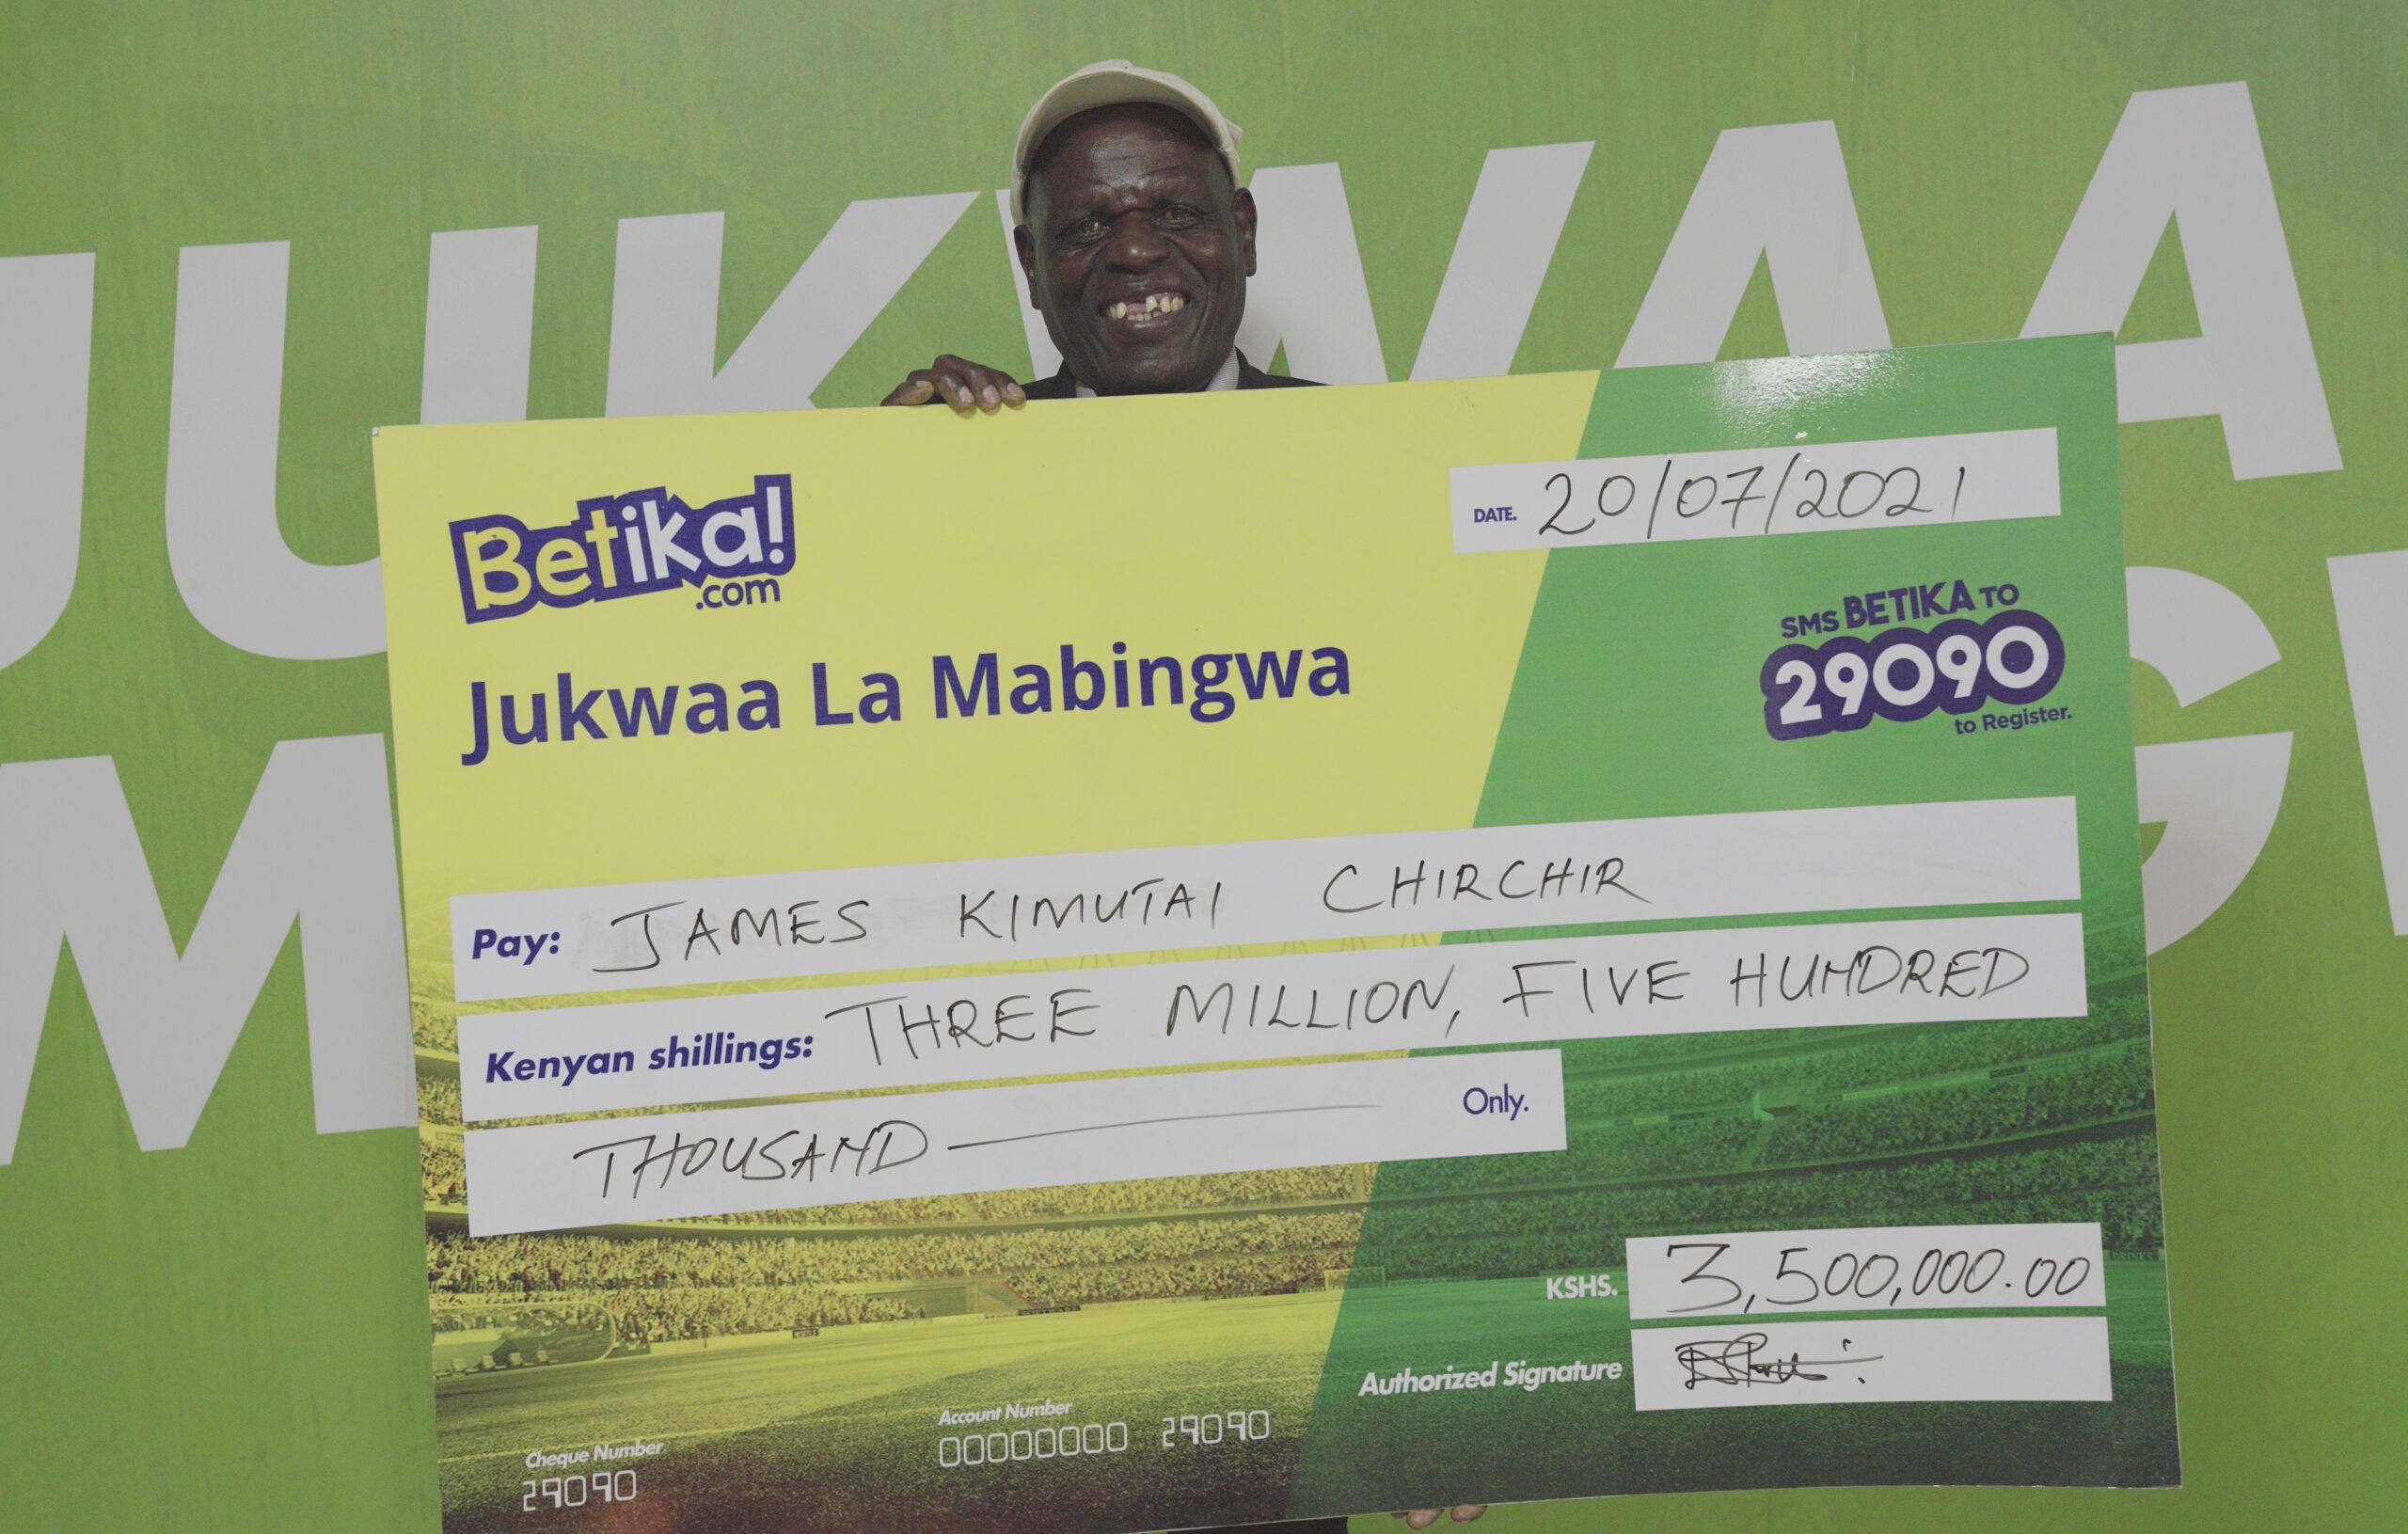 Betika Midweek Jackpot Winners Moments of Glory in Photos